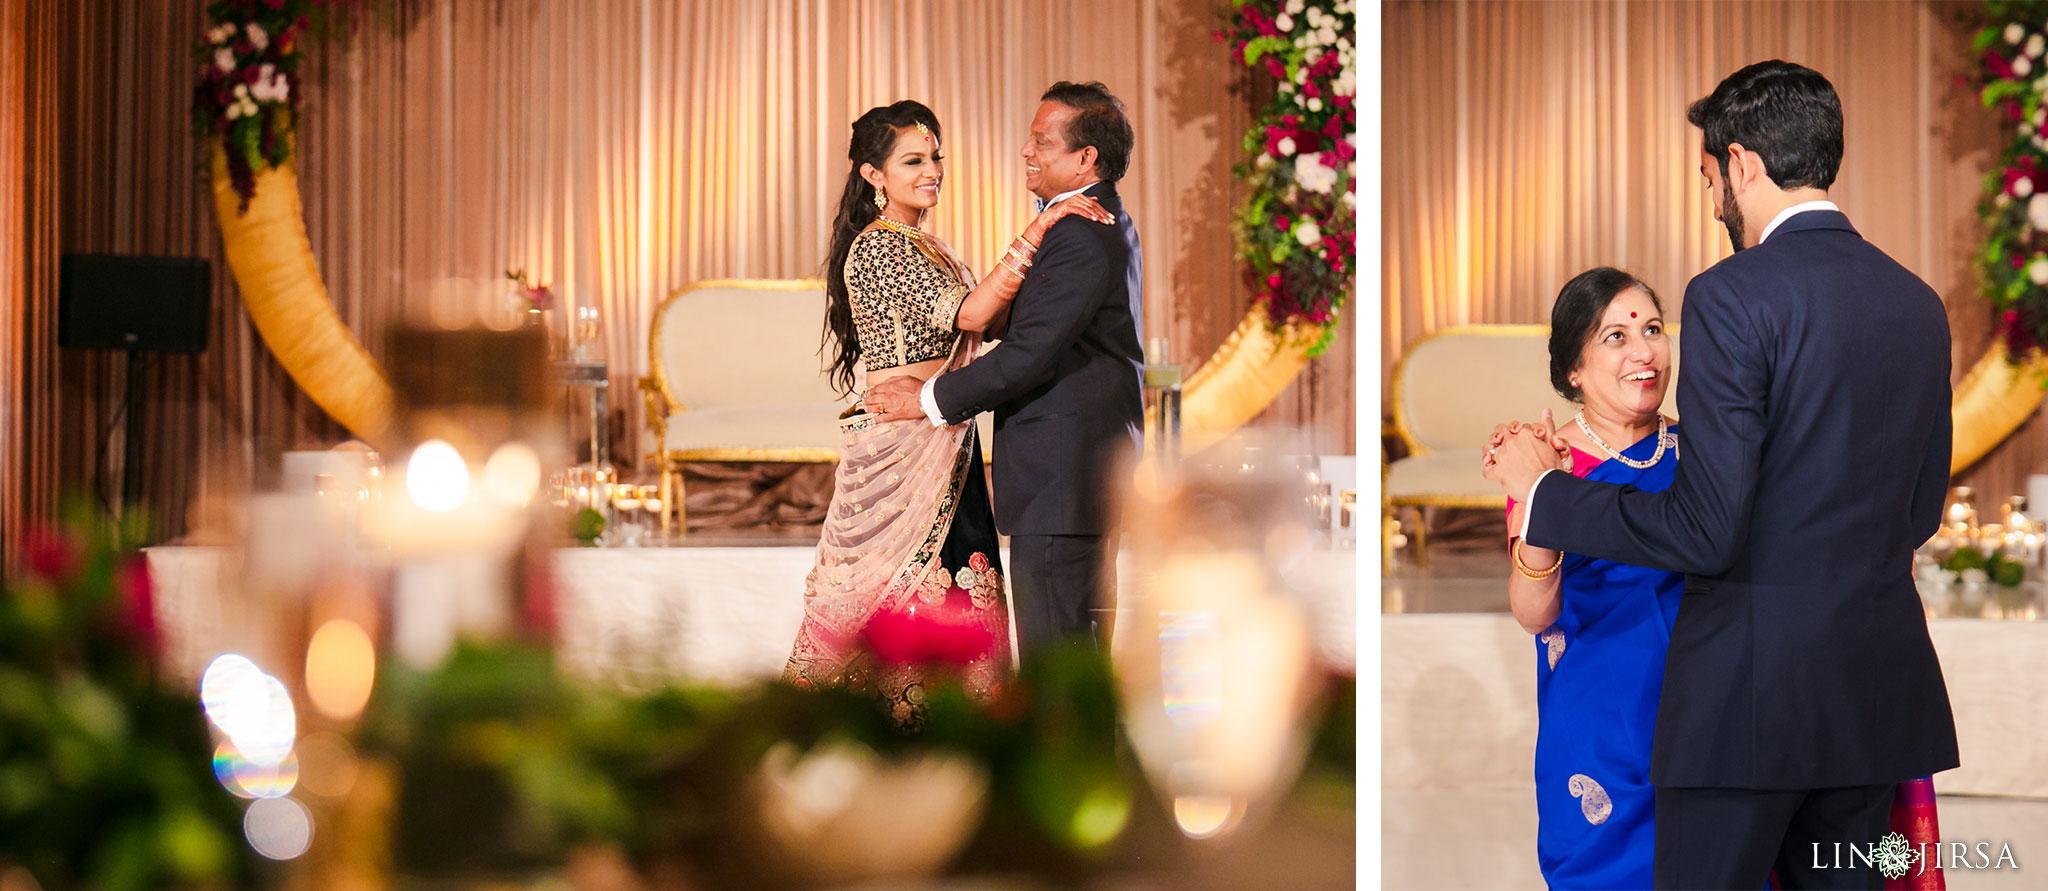 33 laguna cliffs marriott dana point indian wedding reception photography